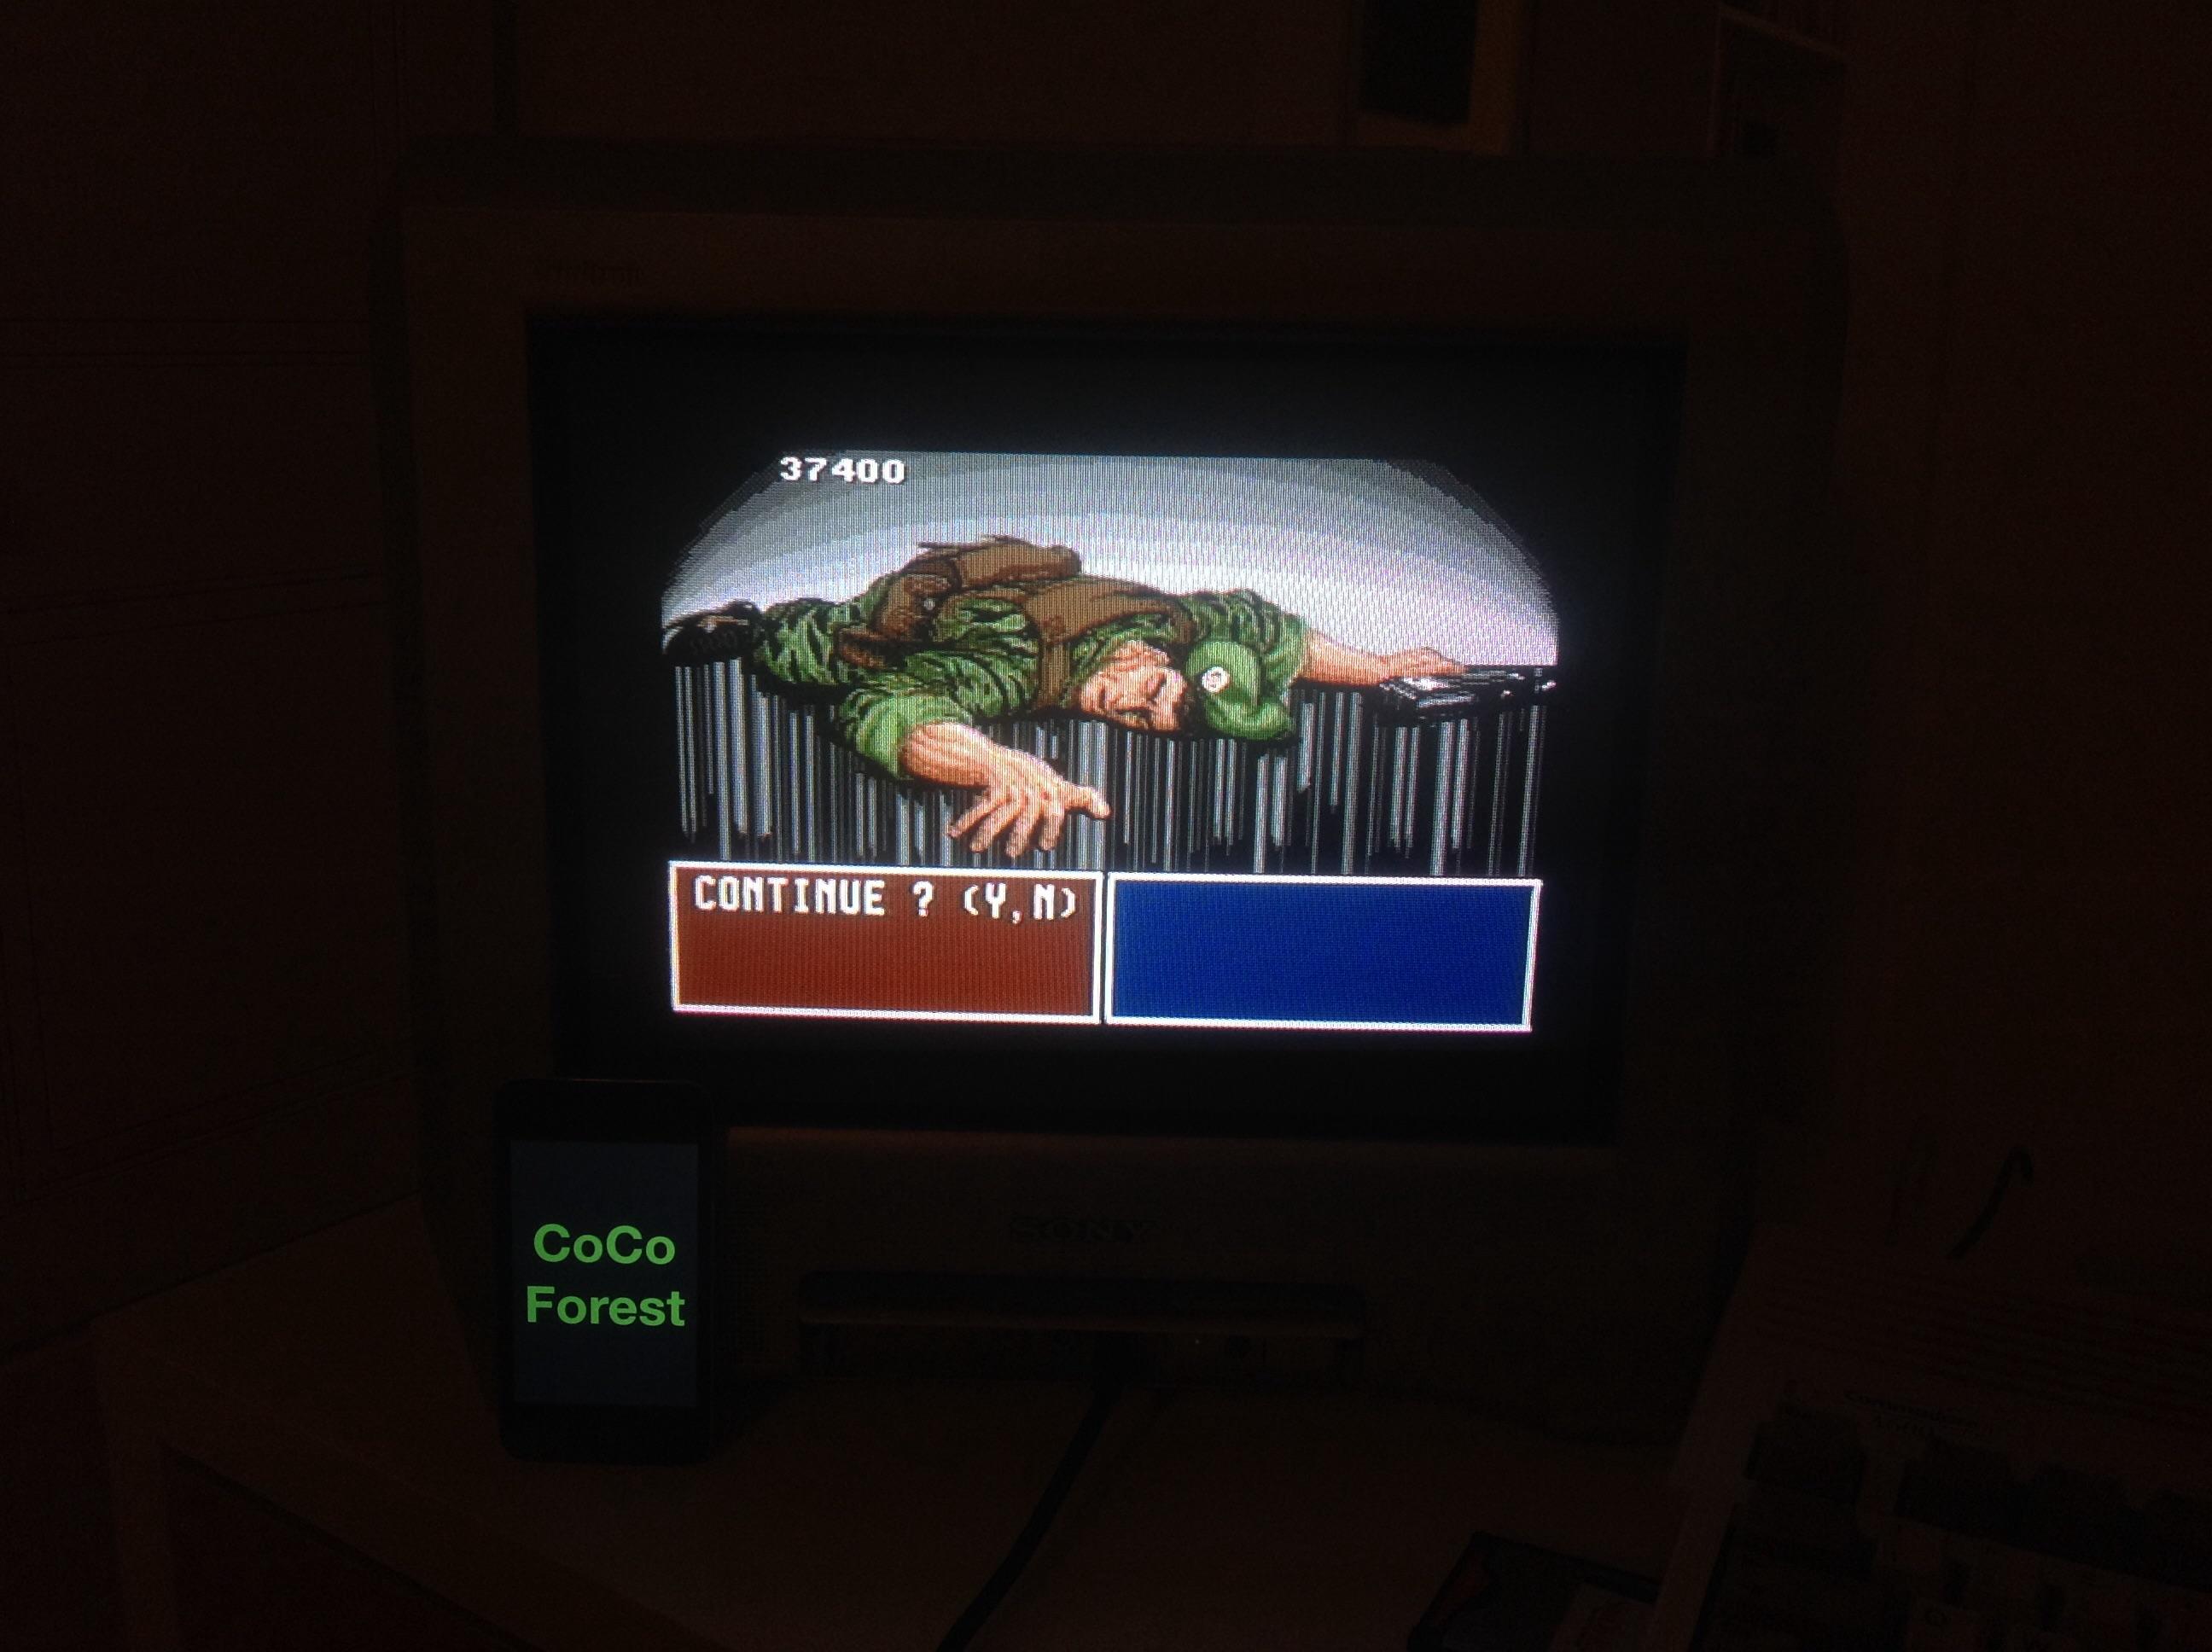 CoCoForest: Operation Thunderbolt (Amiga) 37,400 points on 2014-10-07 13:55:58